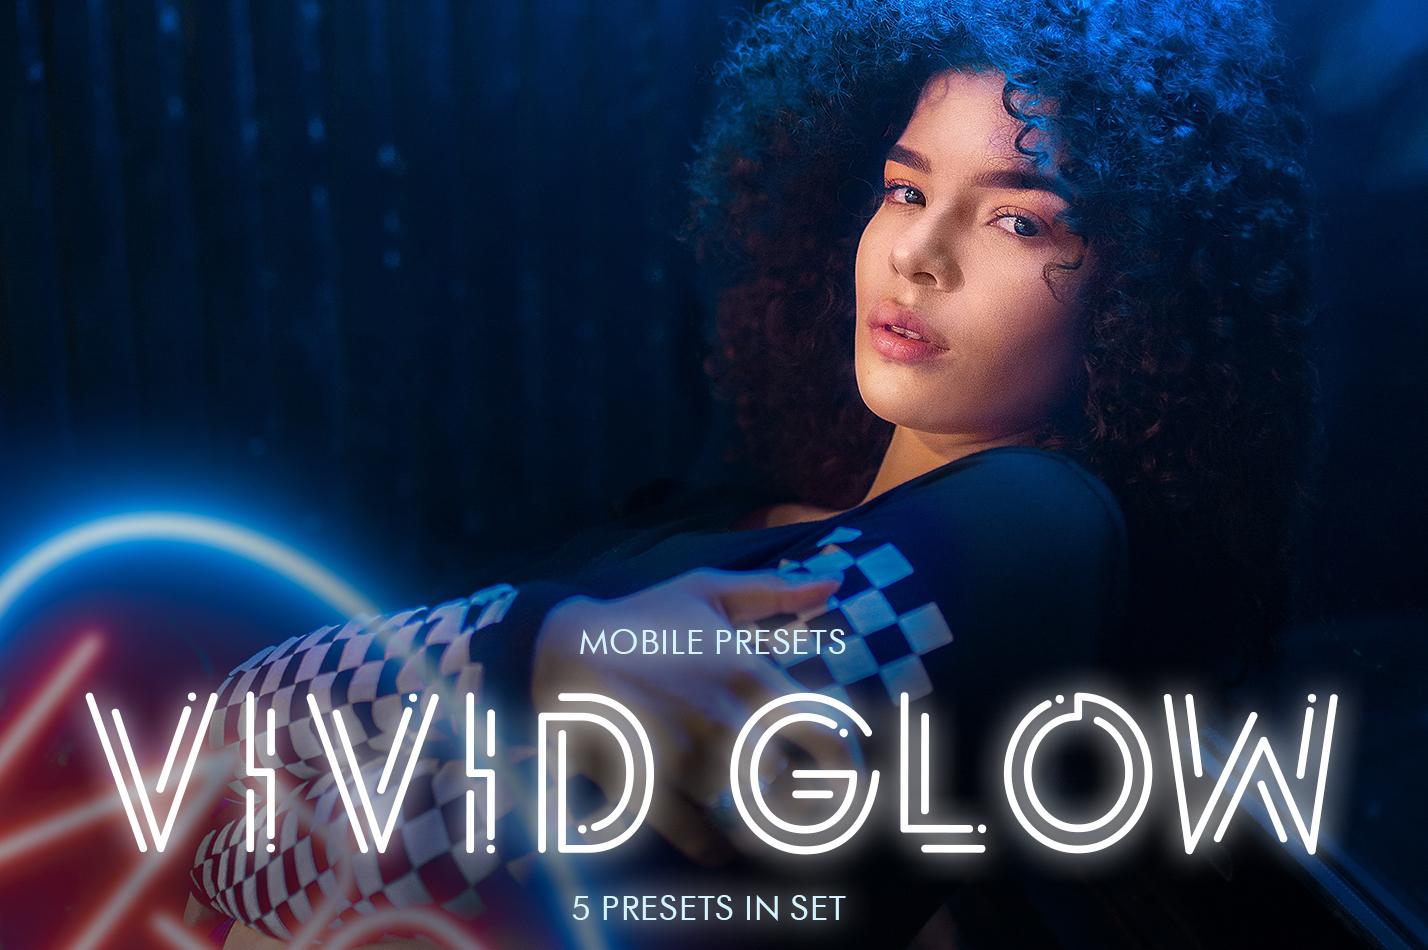 Vivid Glow